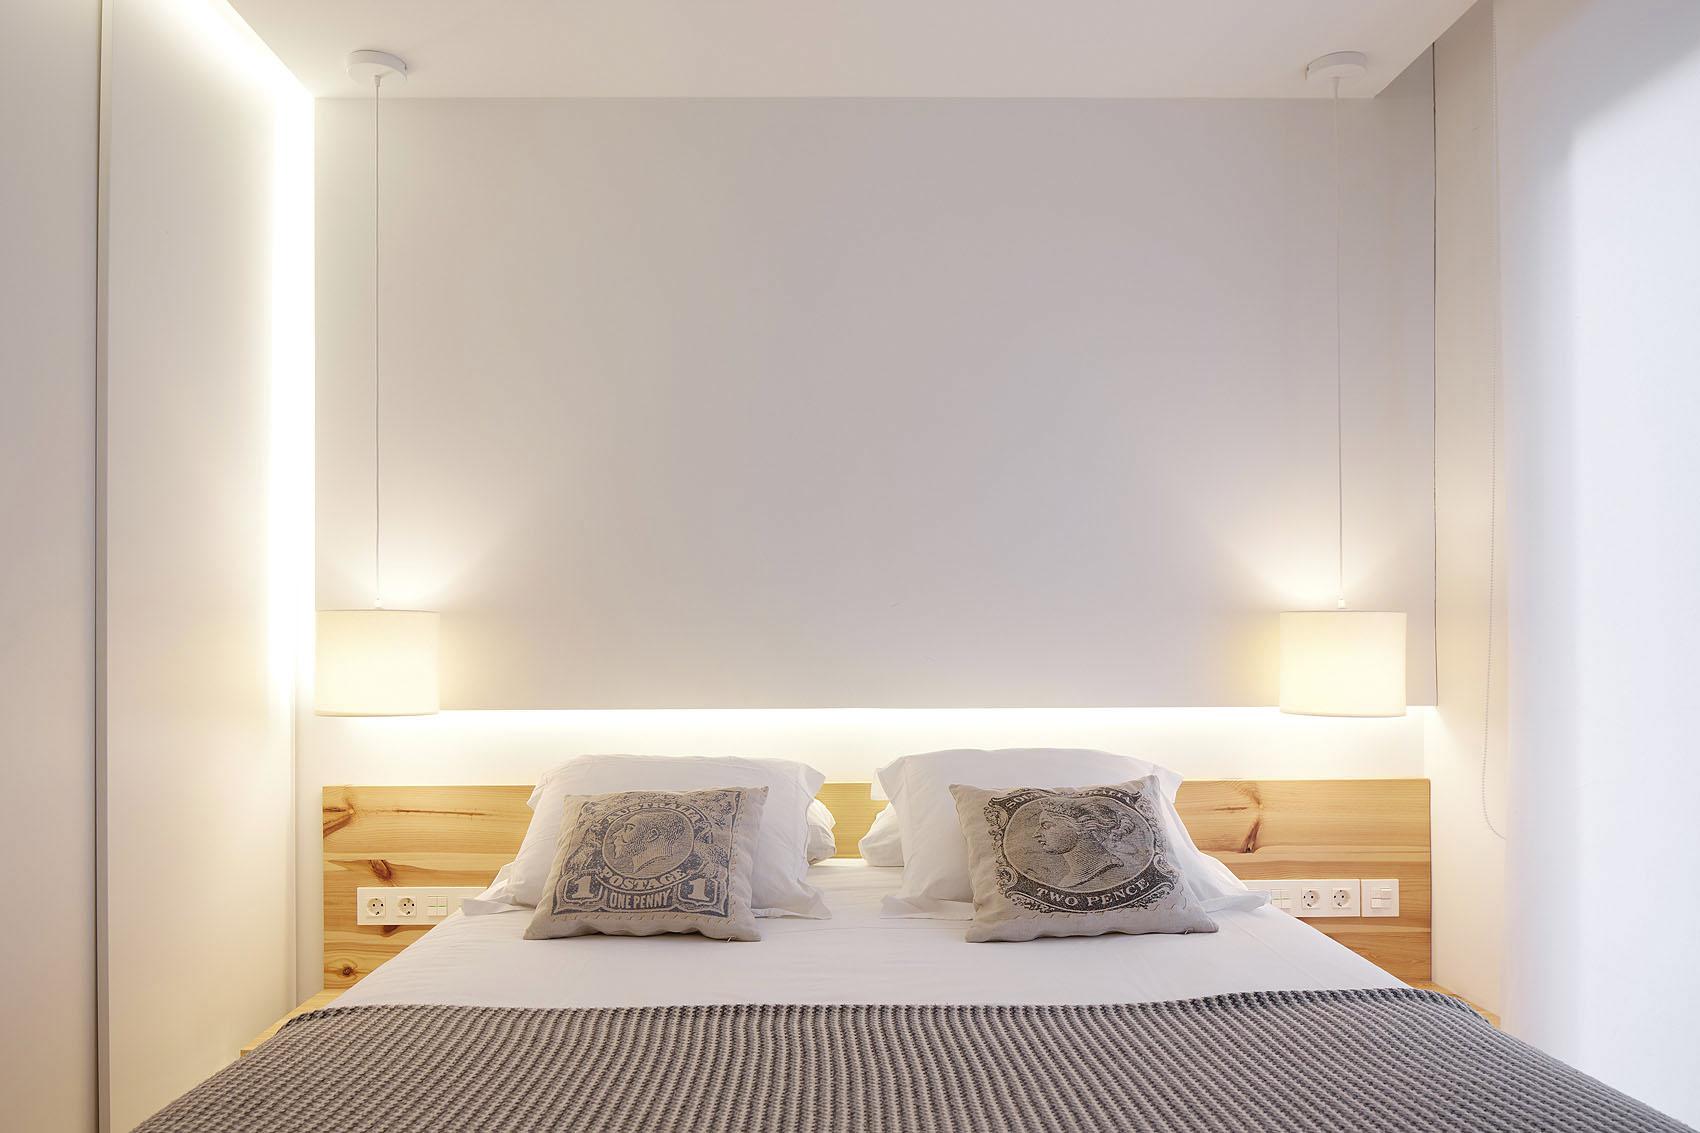 Apartamento en la Parte Vieja donostiarra - Iñaki Caperochipi - Fotografía